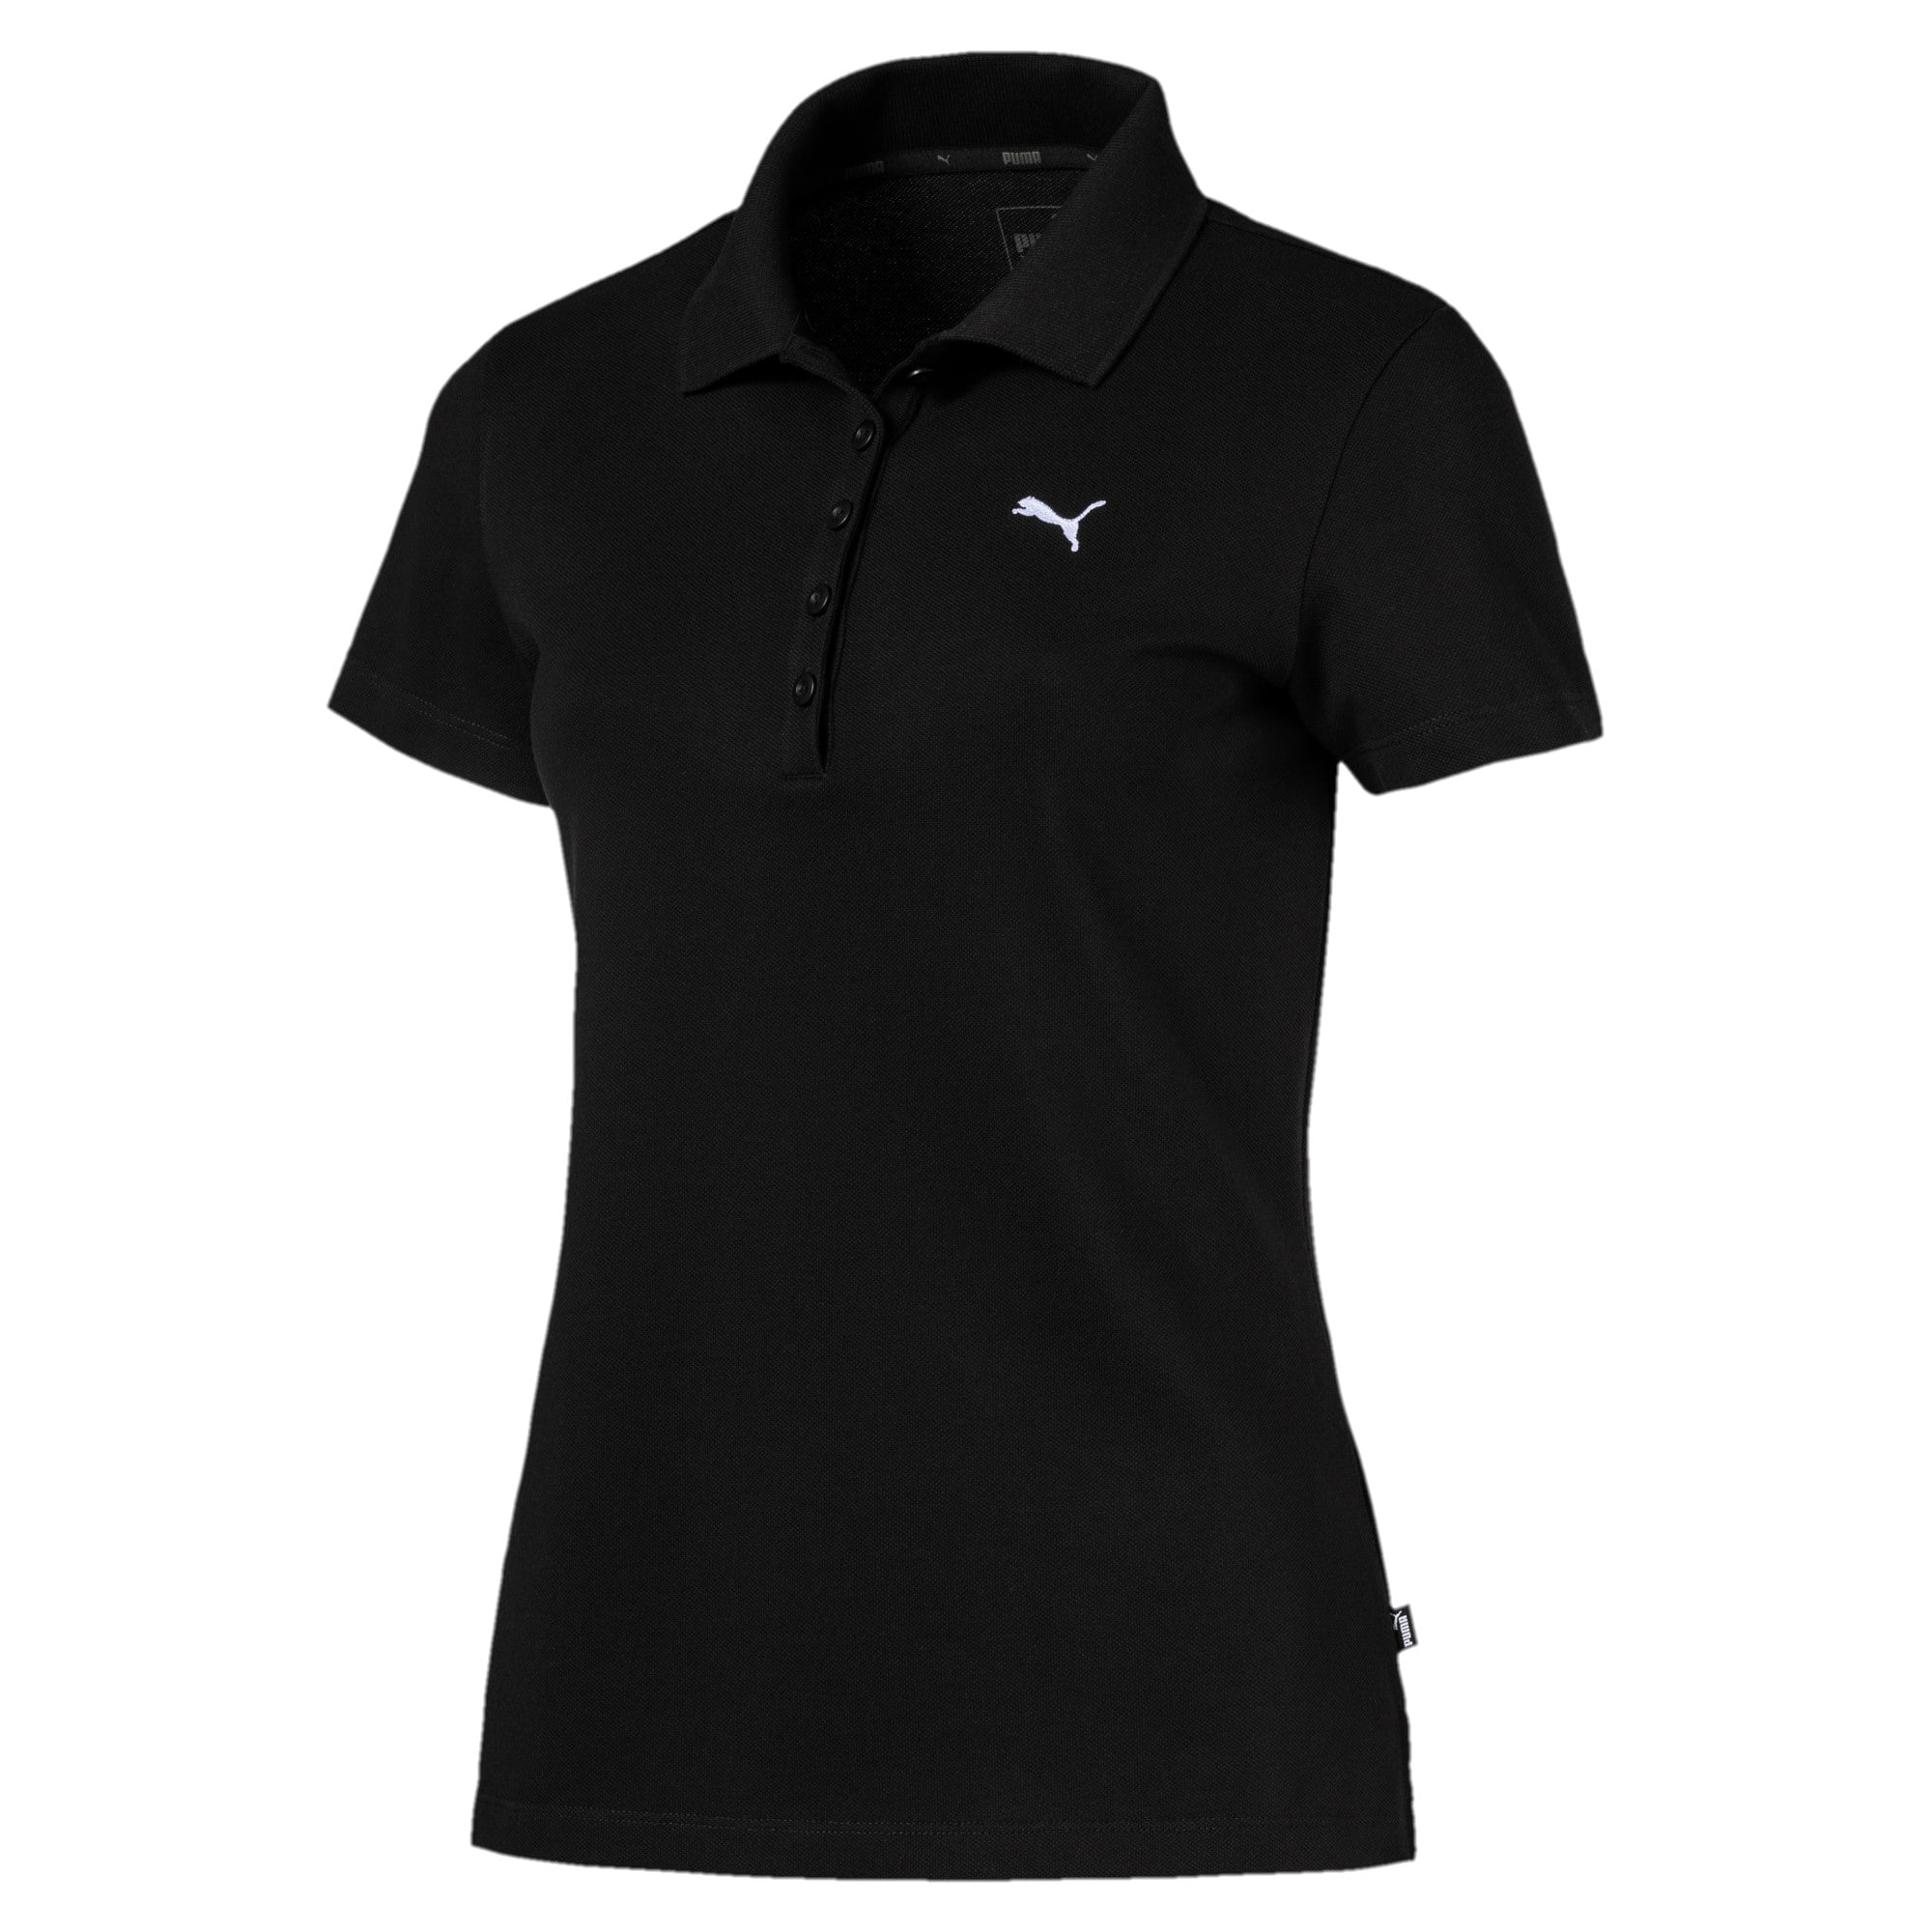 Thumbnail 1 of Essentials Women's Polo, Cotton Black-Cat, medium